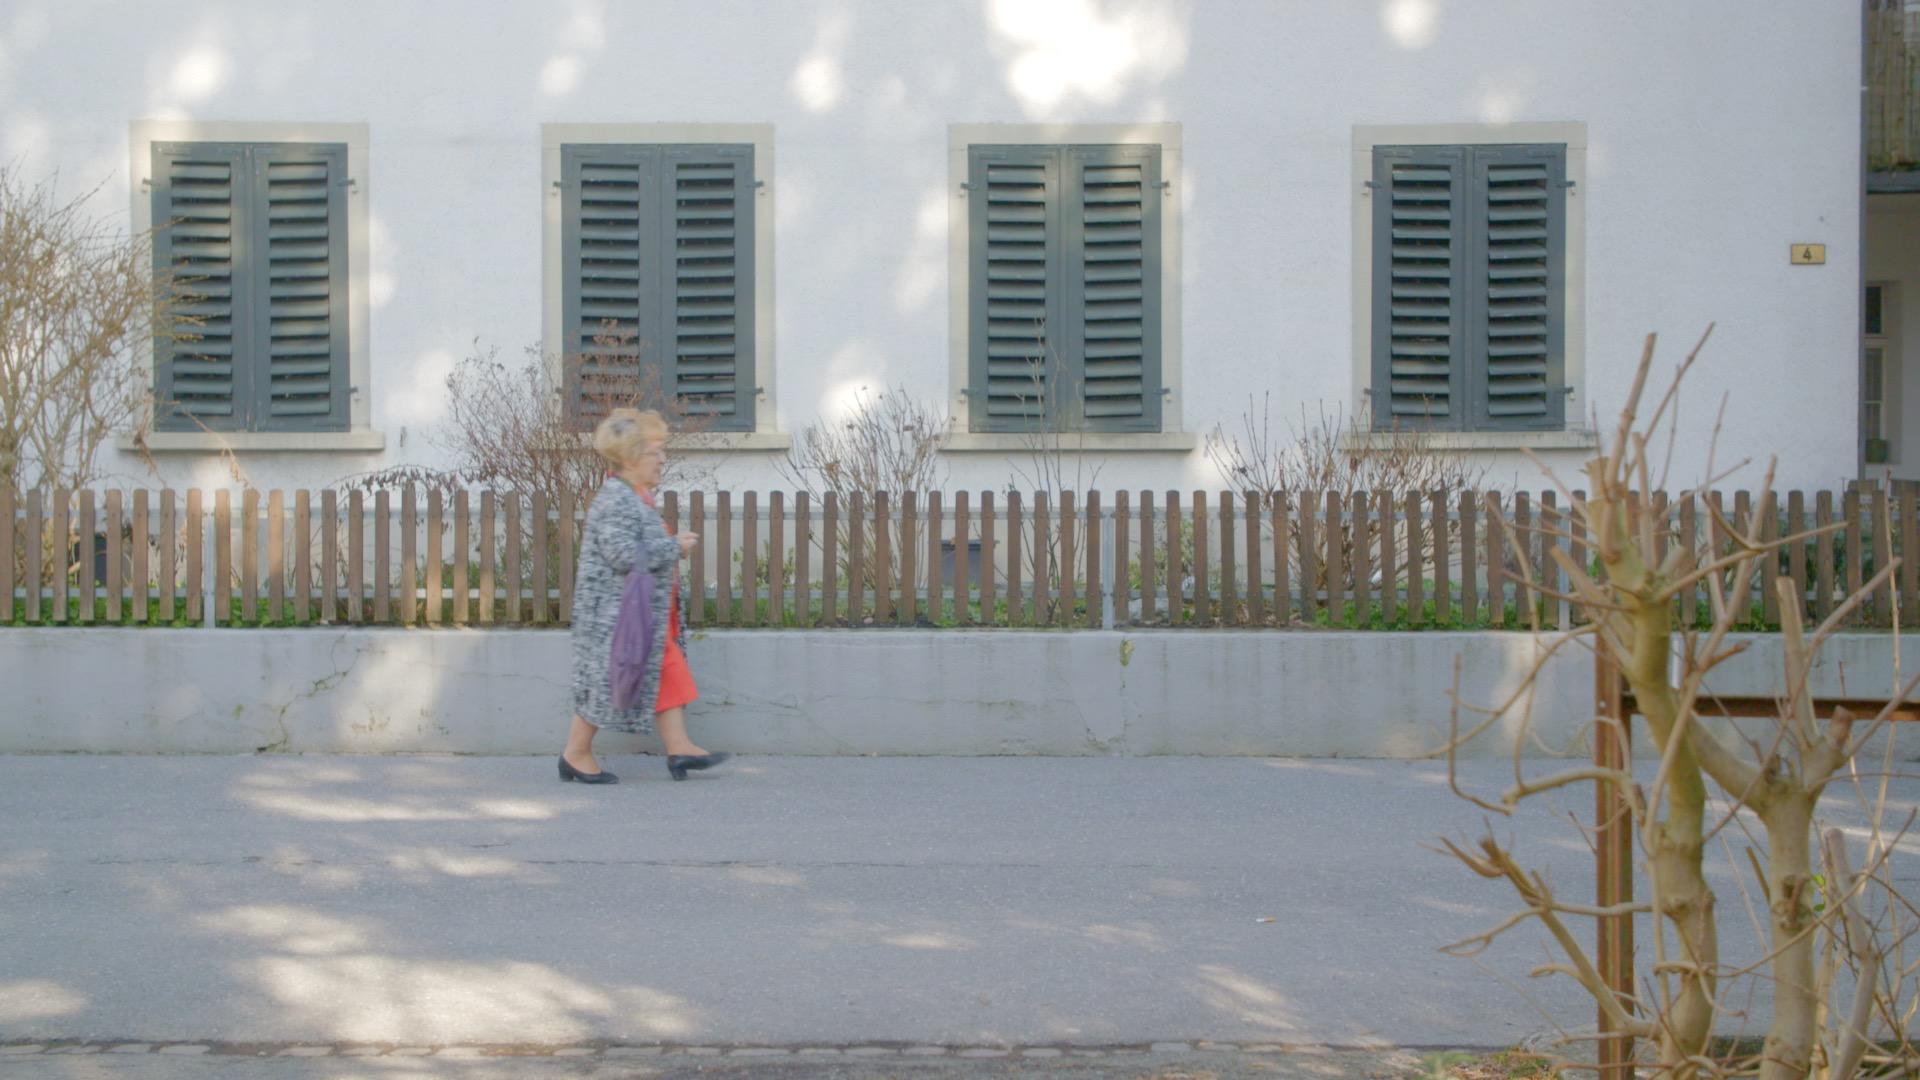 Olga on the way into the village